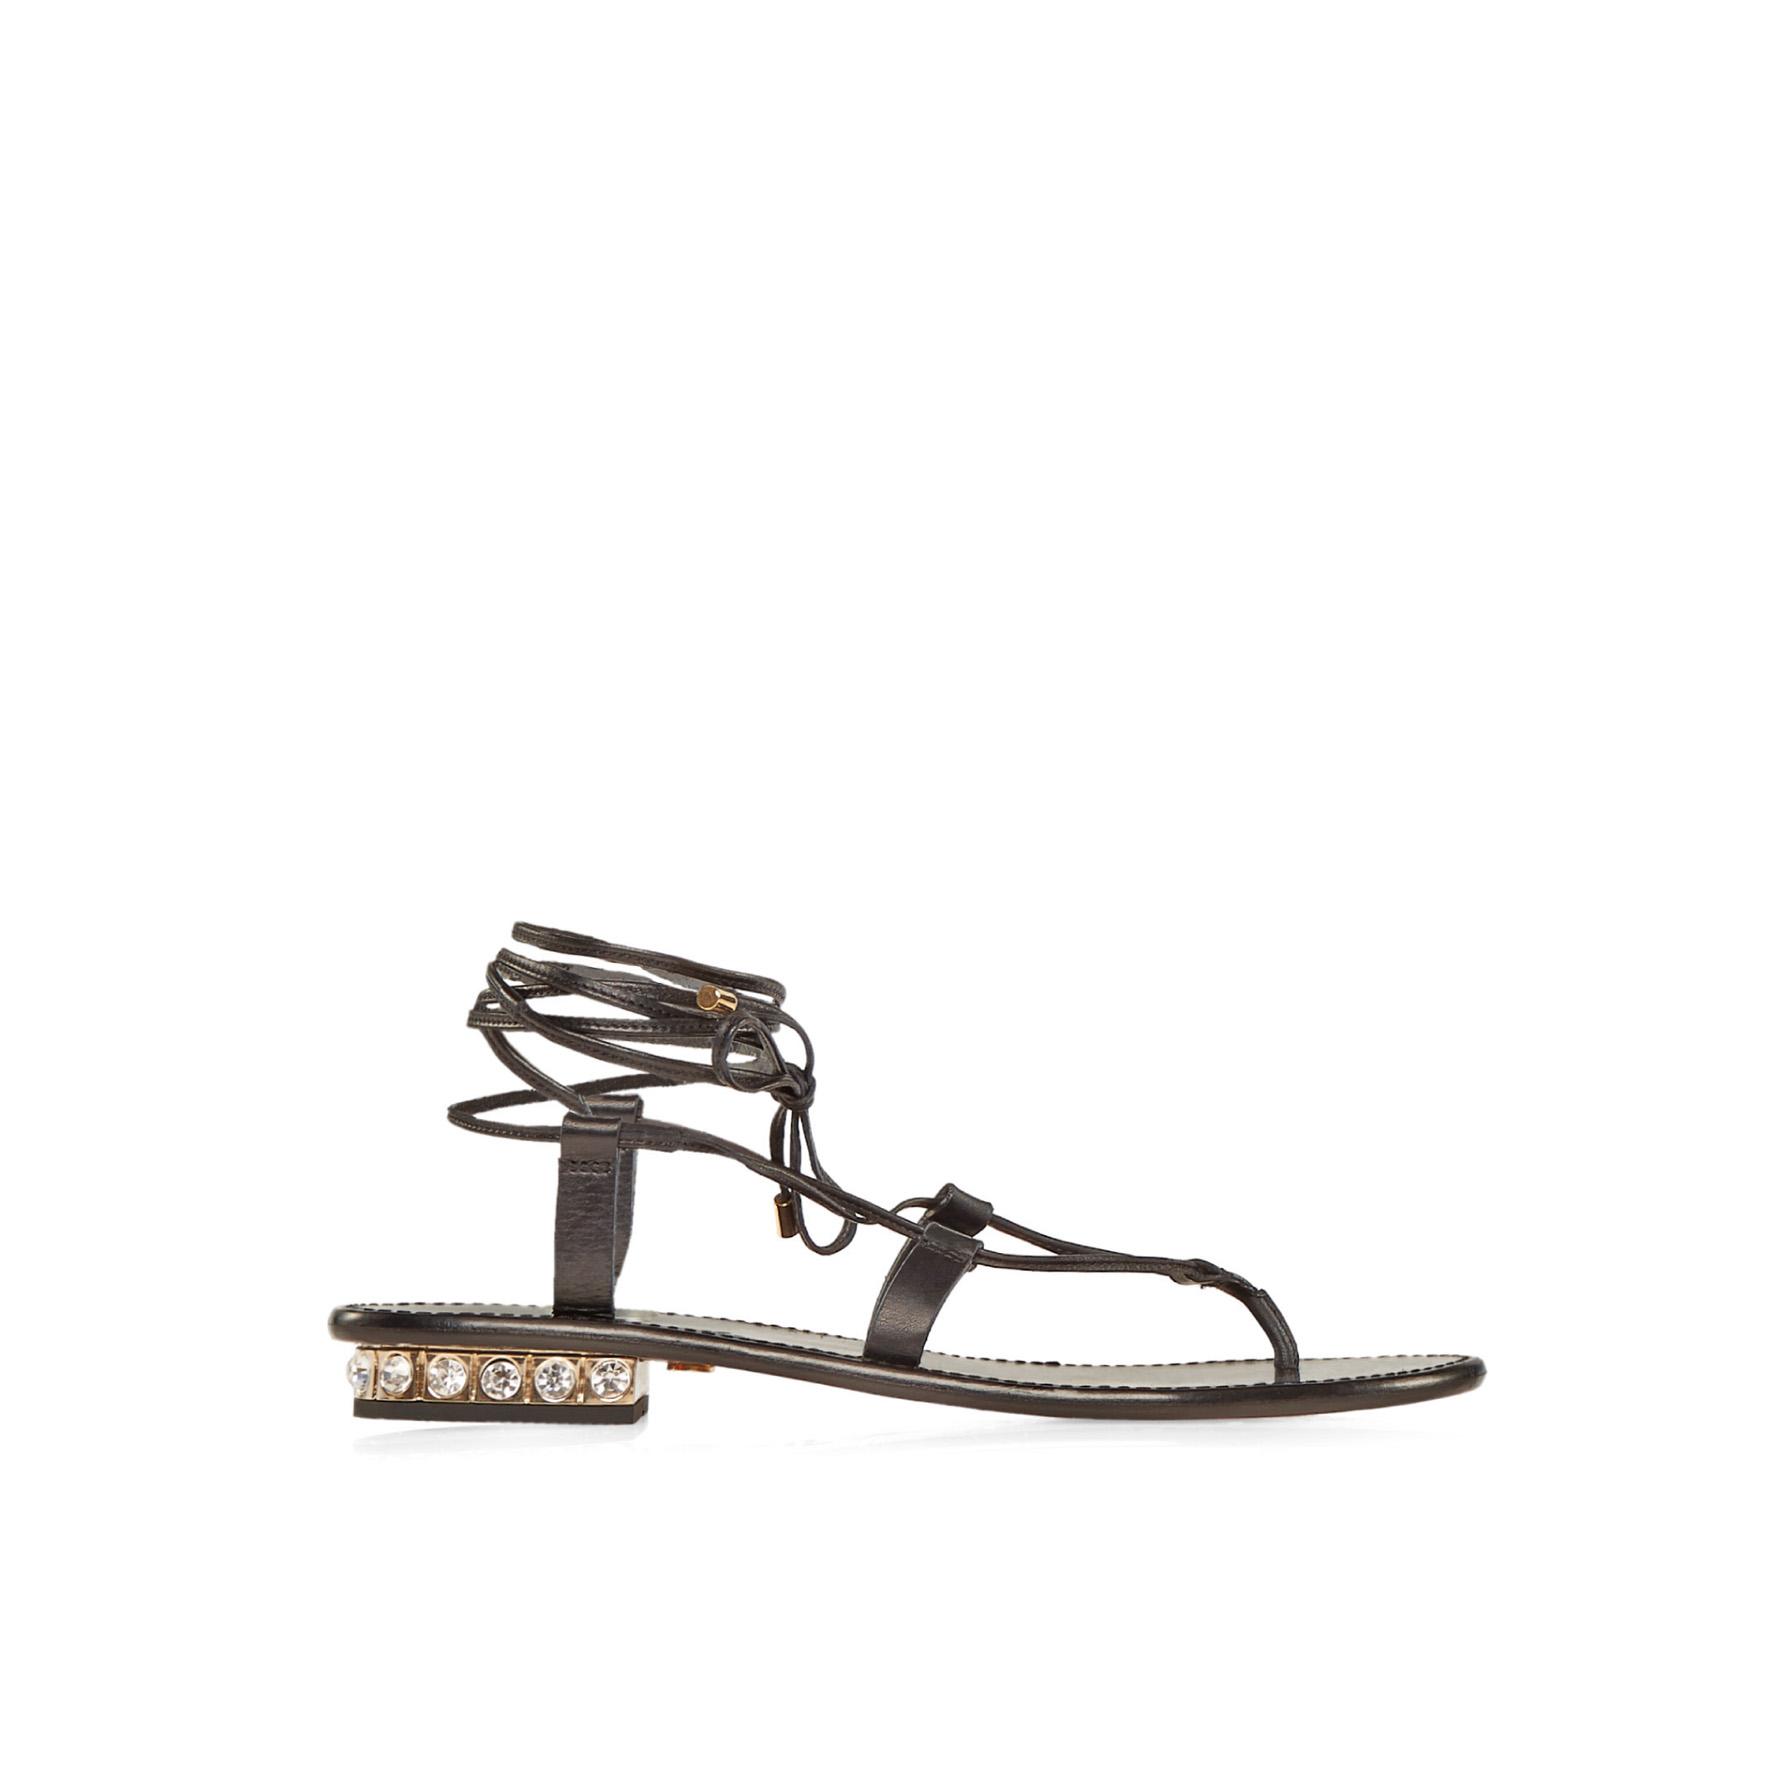 Blumarine Shoes (1)